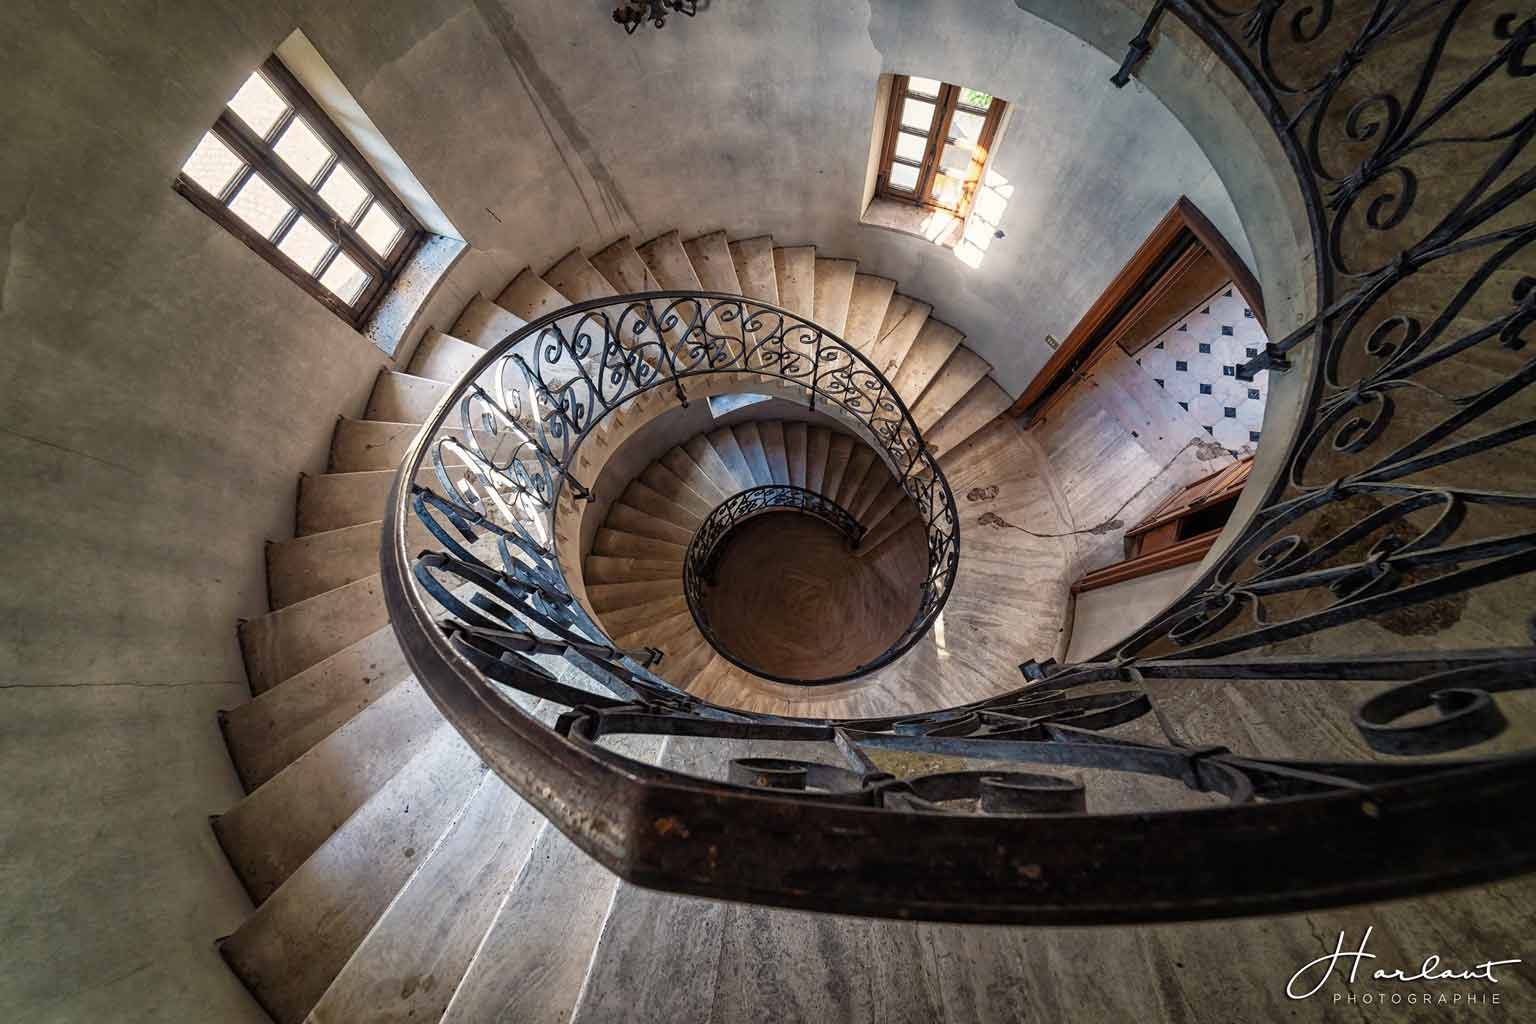 Julien-Harlaut---Escalier_0064